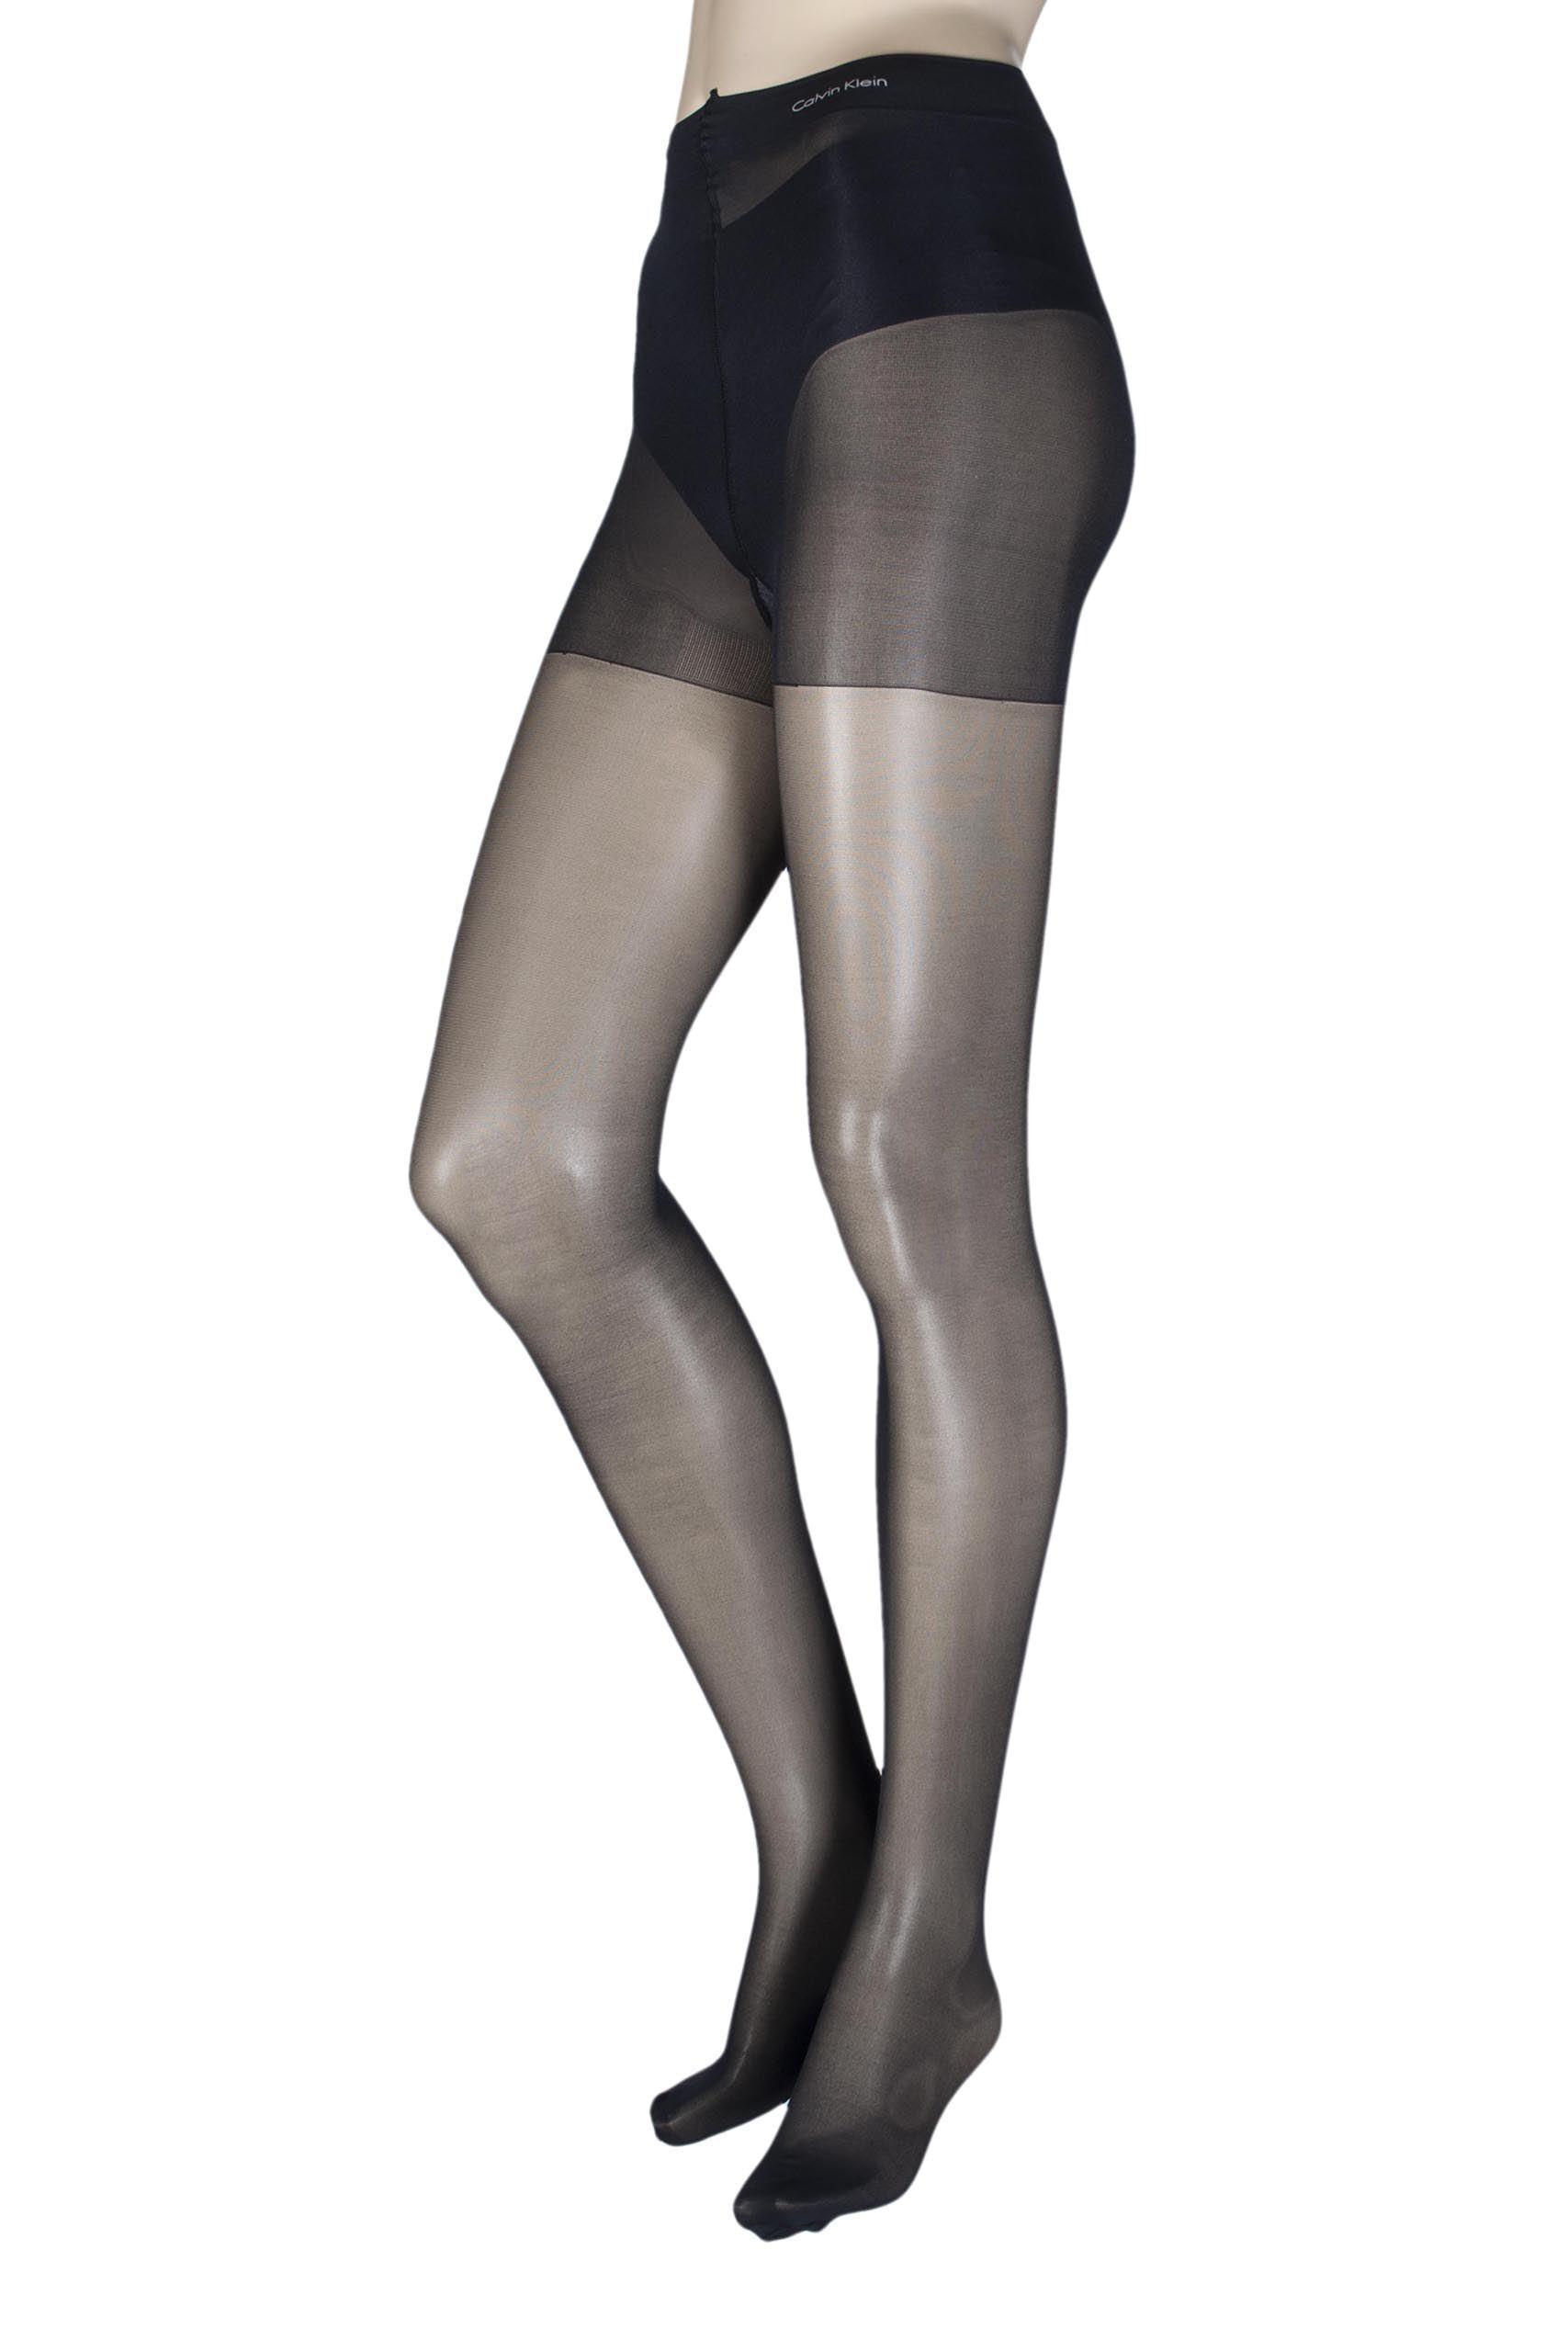 Image of 1 Pair Black Sheer Essentials Active Tights with Control Top Ladies Medium - Calvin Klein